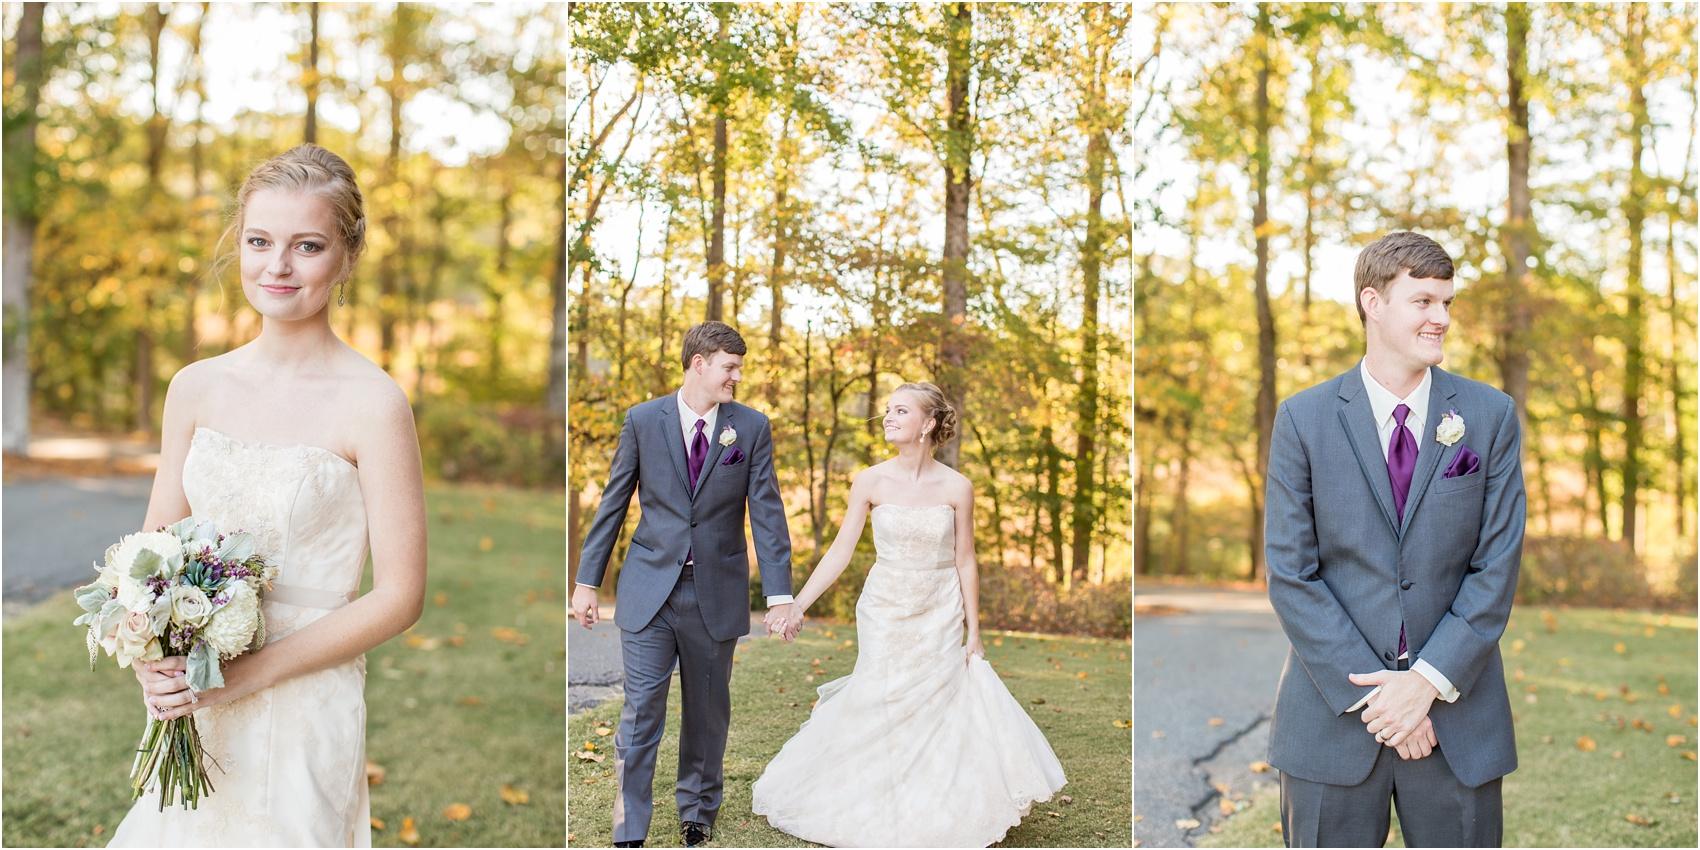 Savannah Eve Photography- Perkins Wedding- Blog-24.jpg